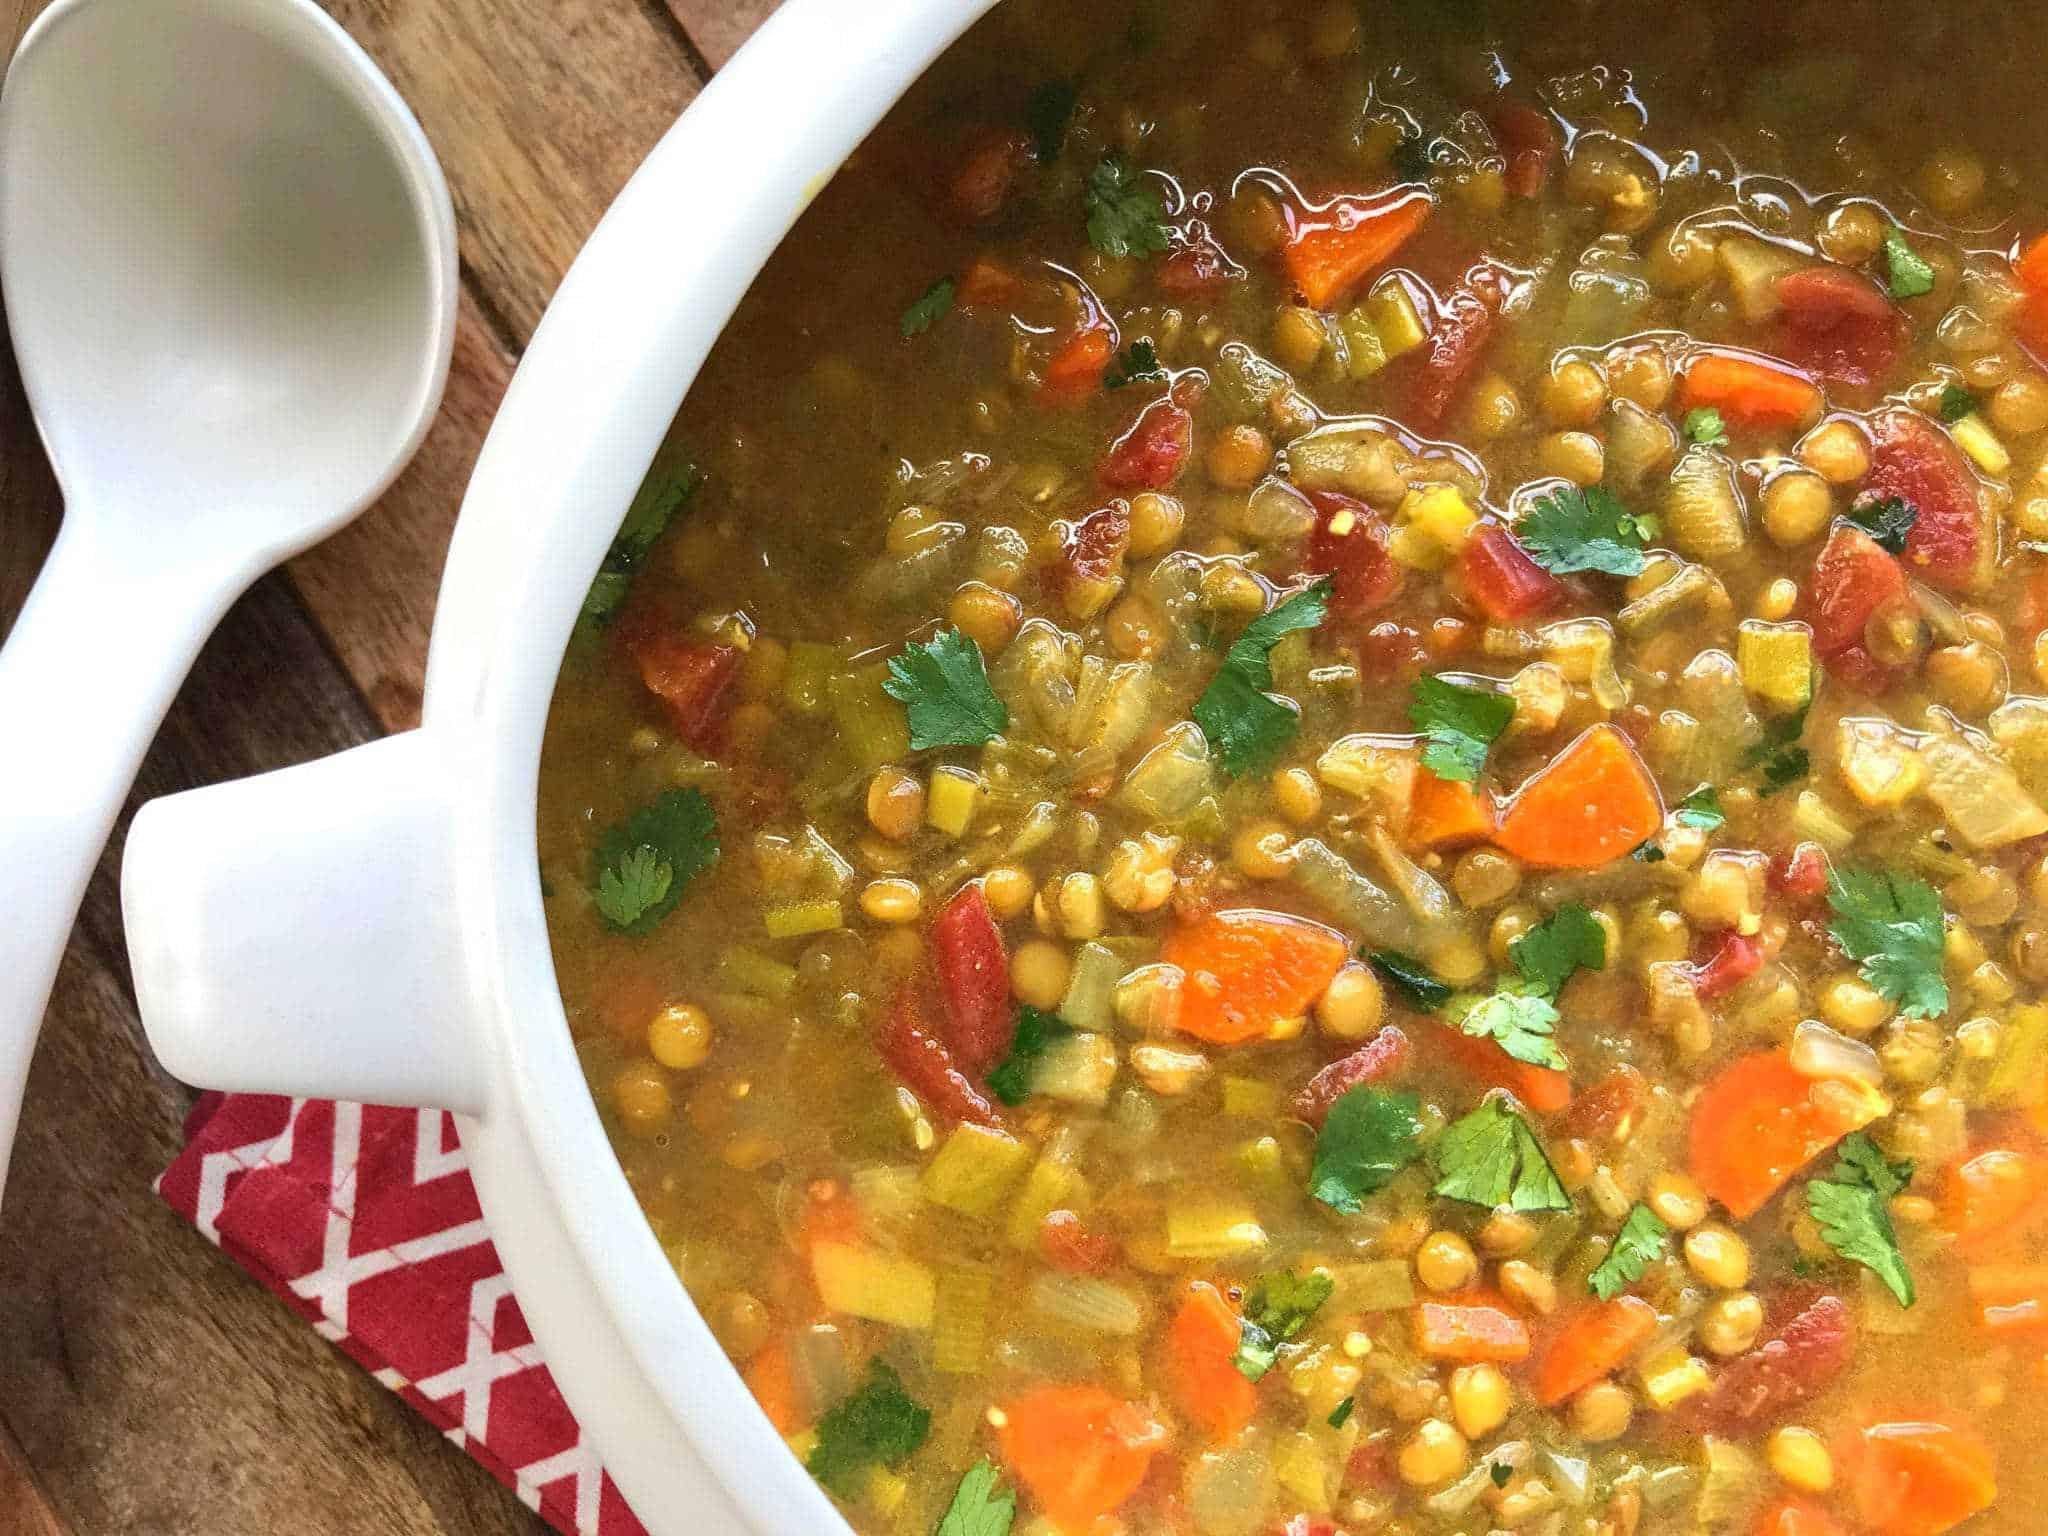 curried lentil soup recipe best healthy vegetarian vegan gluten free